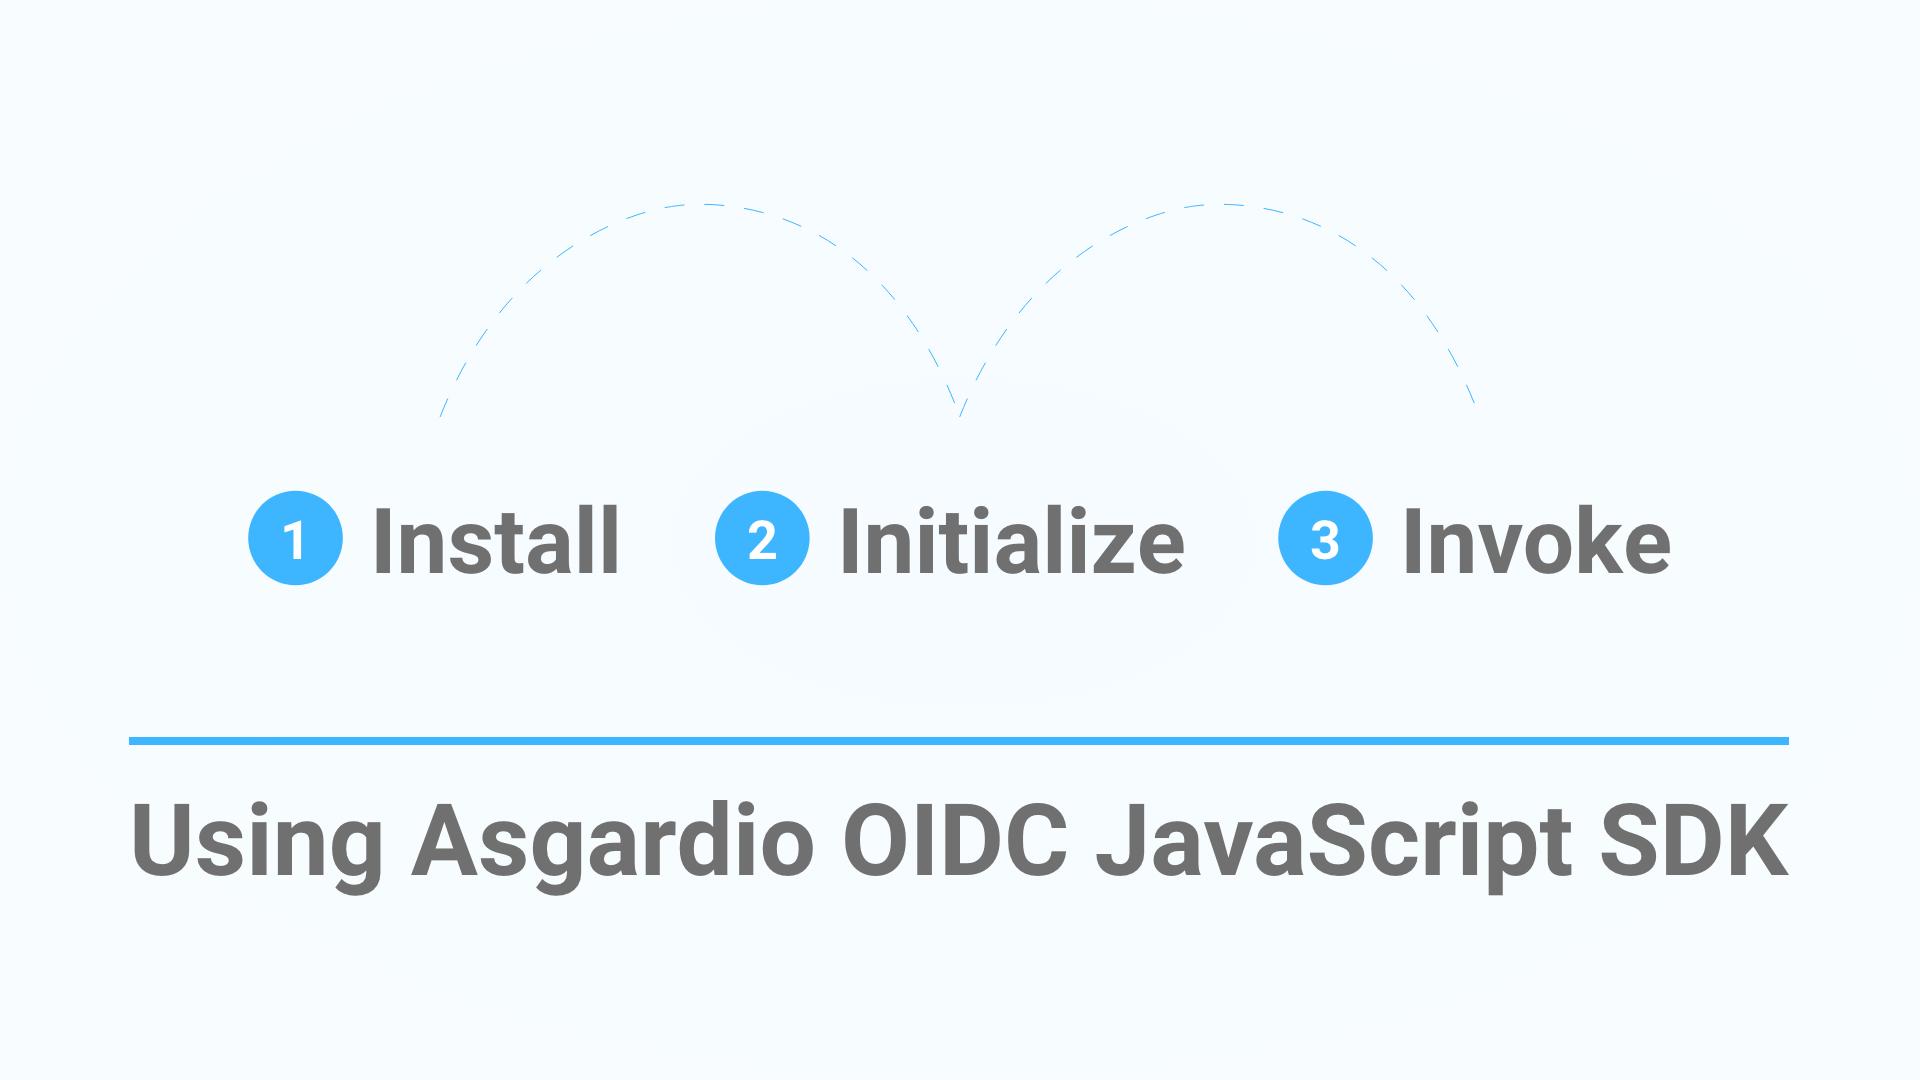 Asgardio OIDC JS SDK: Bootstrap in three easy steps